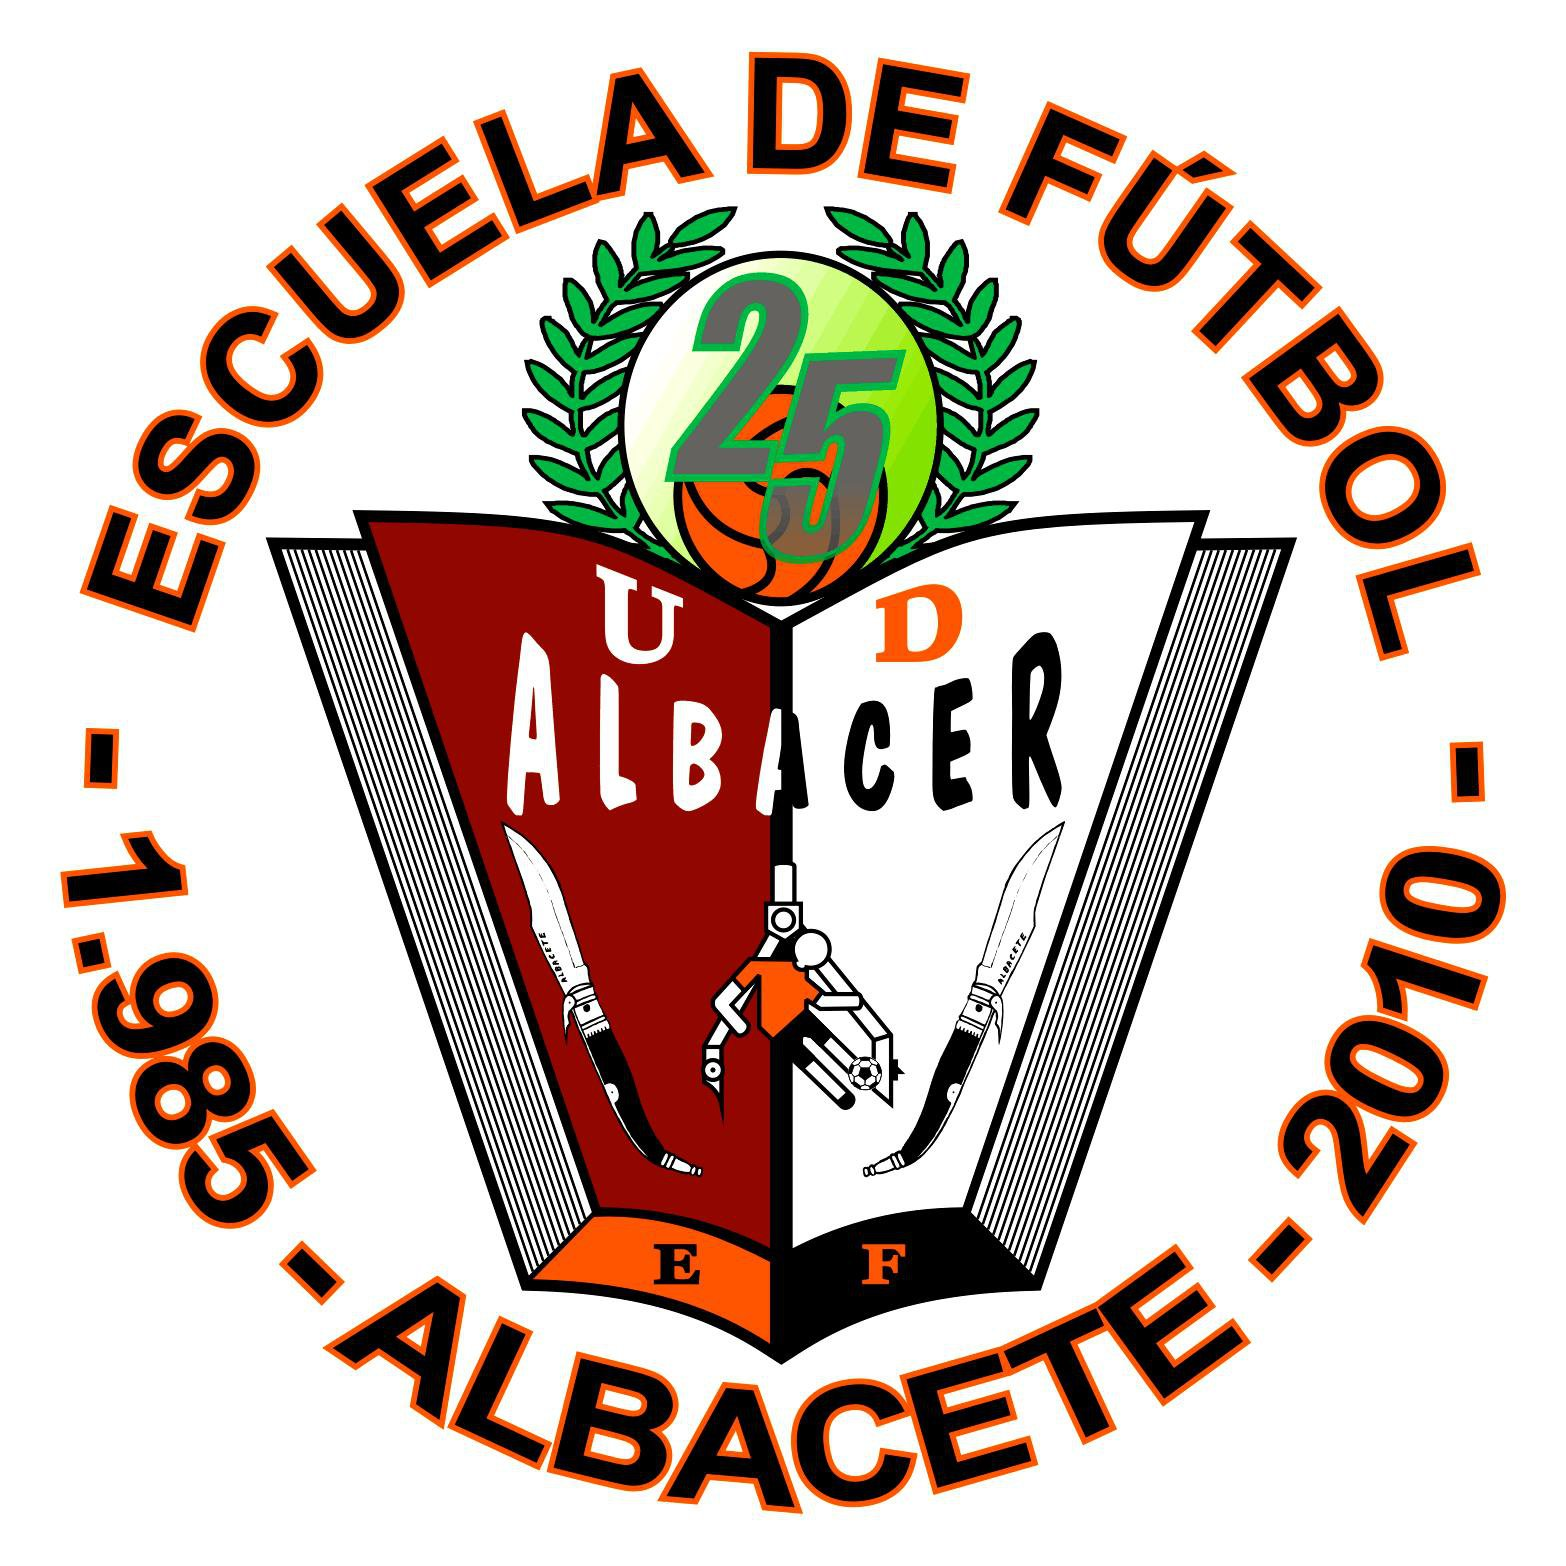 EFUD Albacer